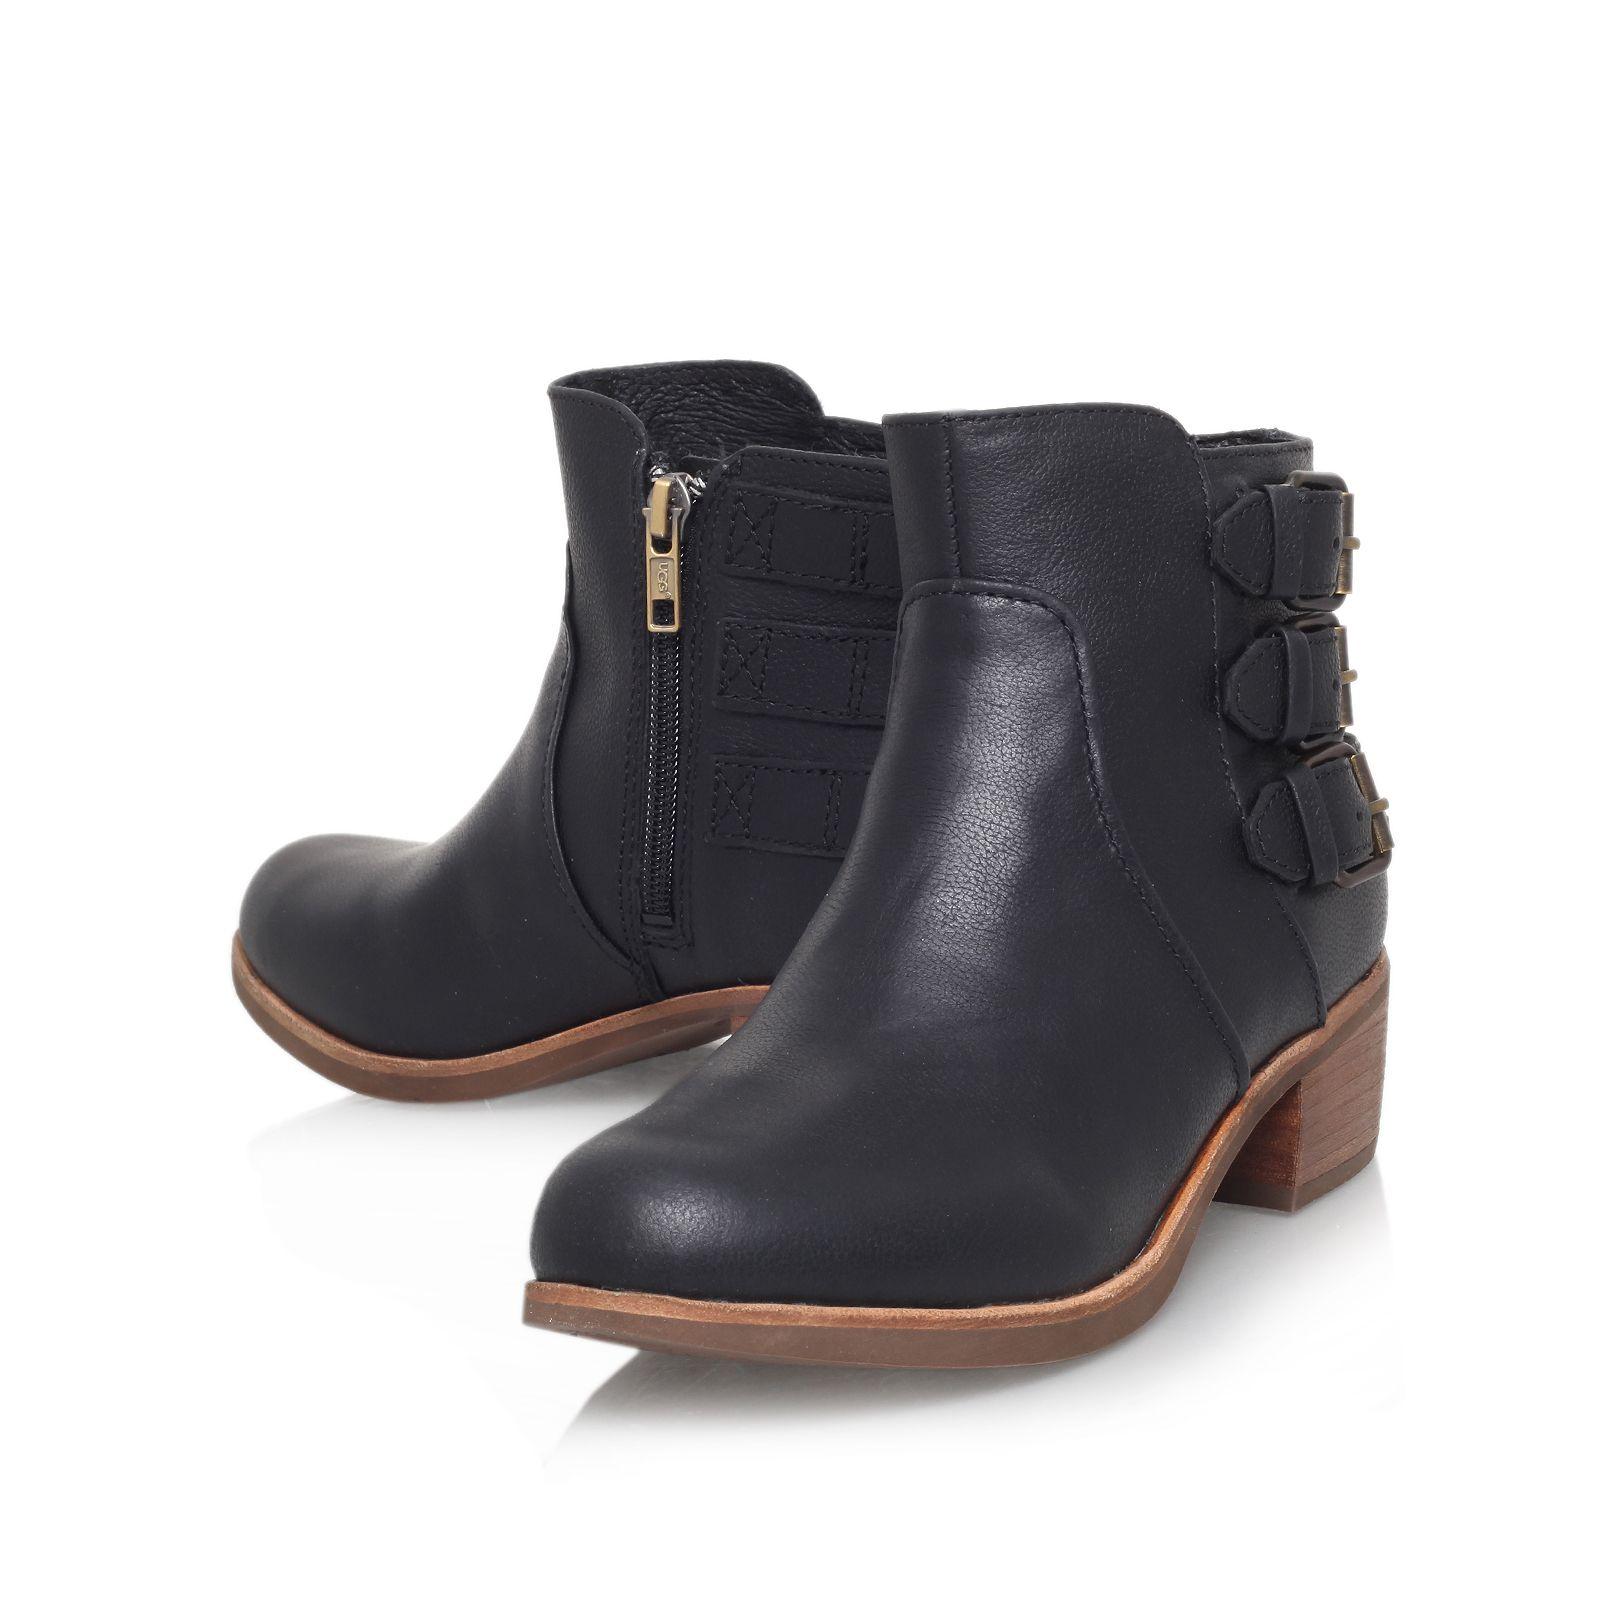 ugg volta low block heel ankle boots in black lyst